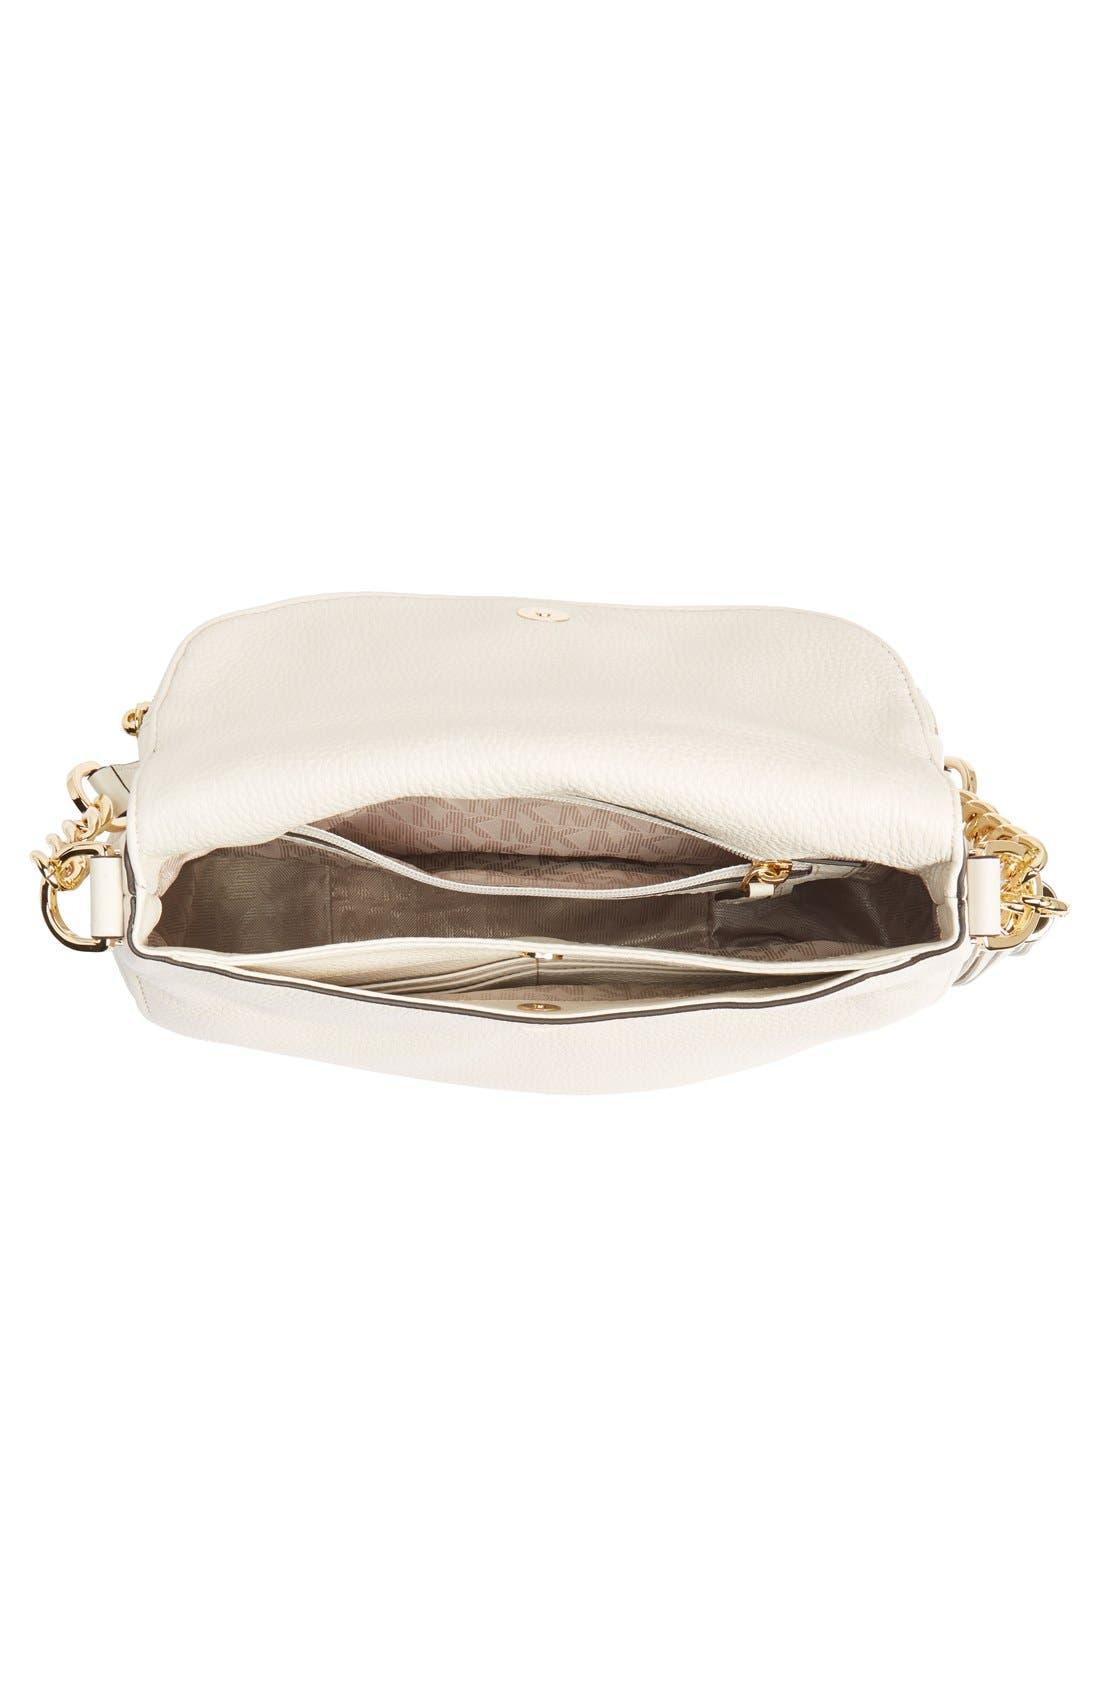 ,                             'Bedford Tassel - Medium' Convertible Leather Shoulder Bag,                             Alternate thumbnail 54, color,                             901